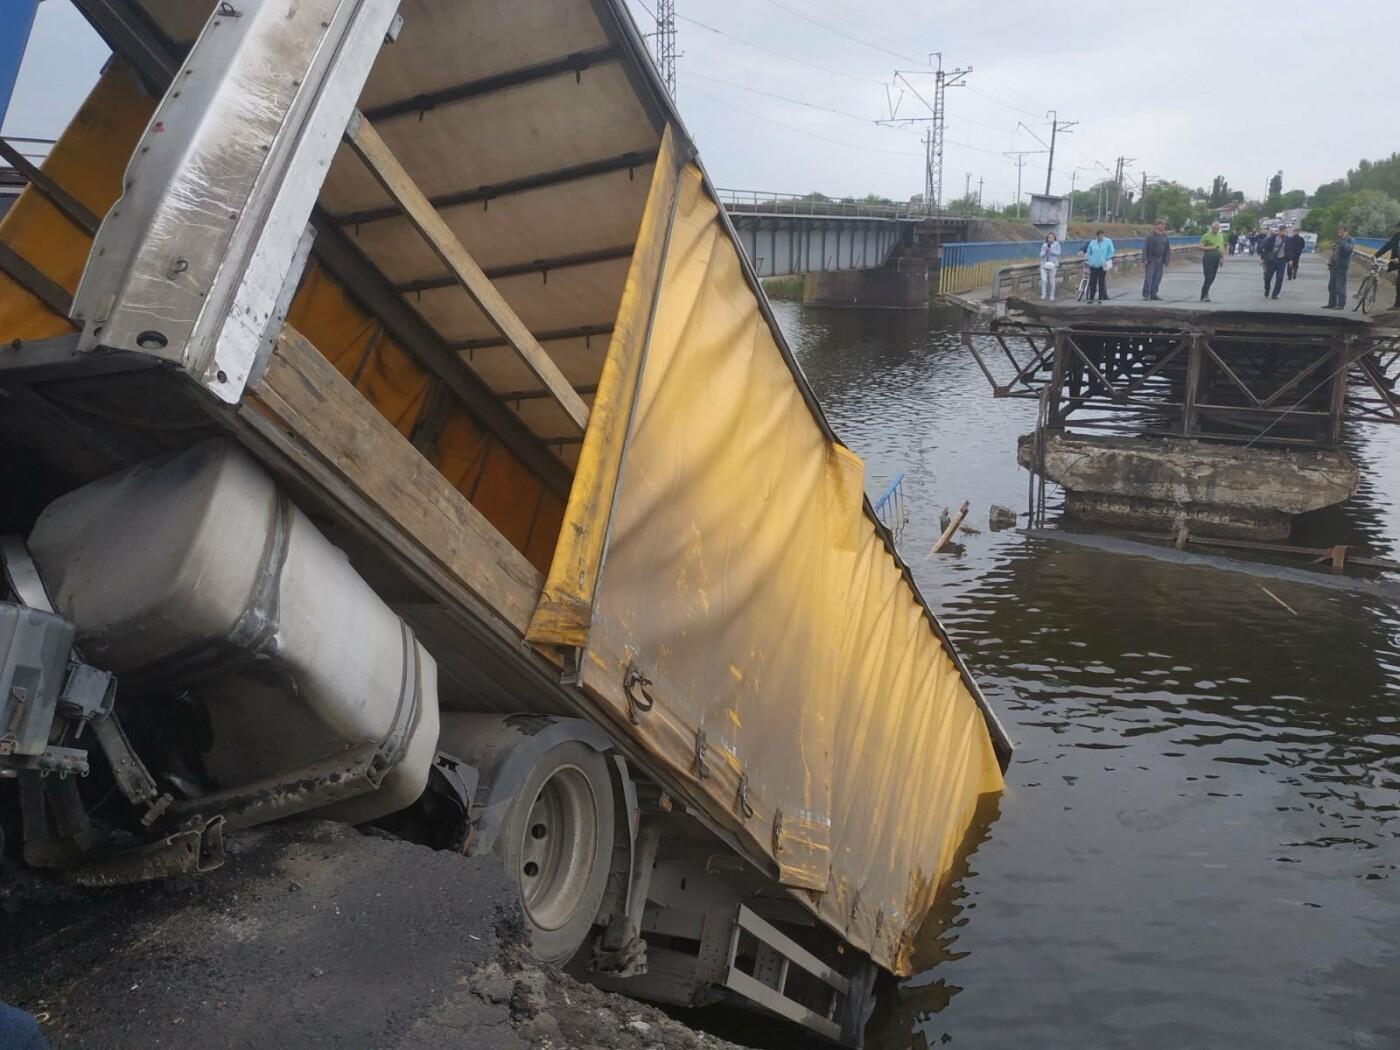 В Днепропетровской области рухнул мост вместе с фурой, - ФОТО, фото-1